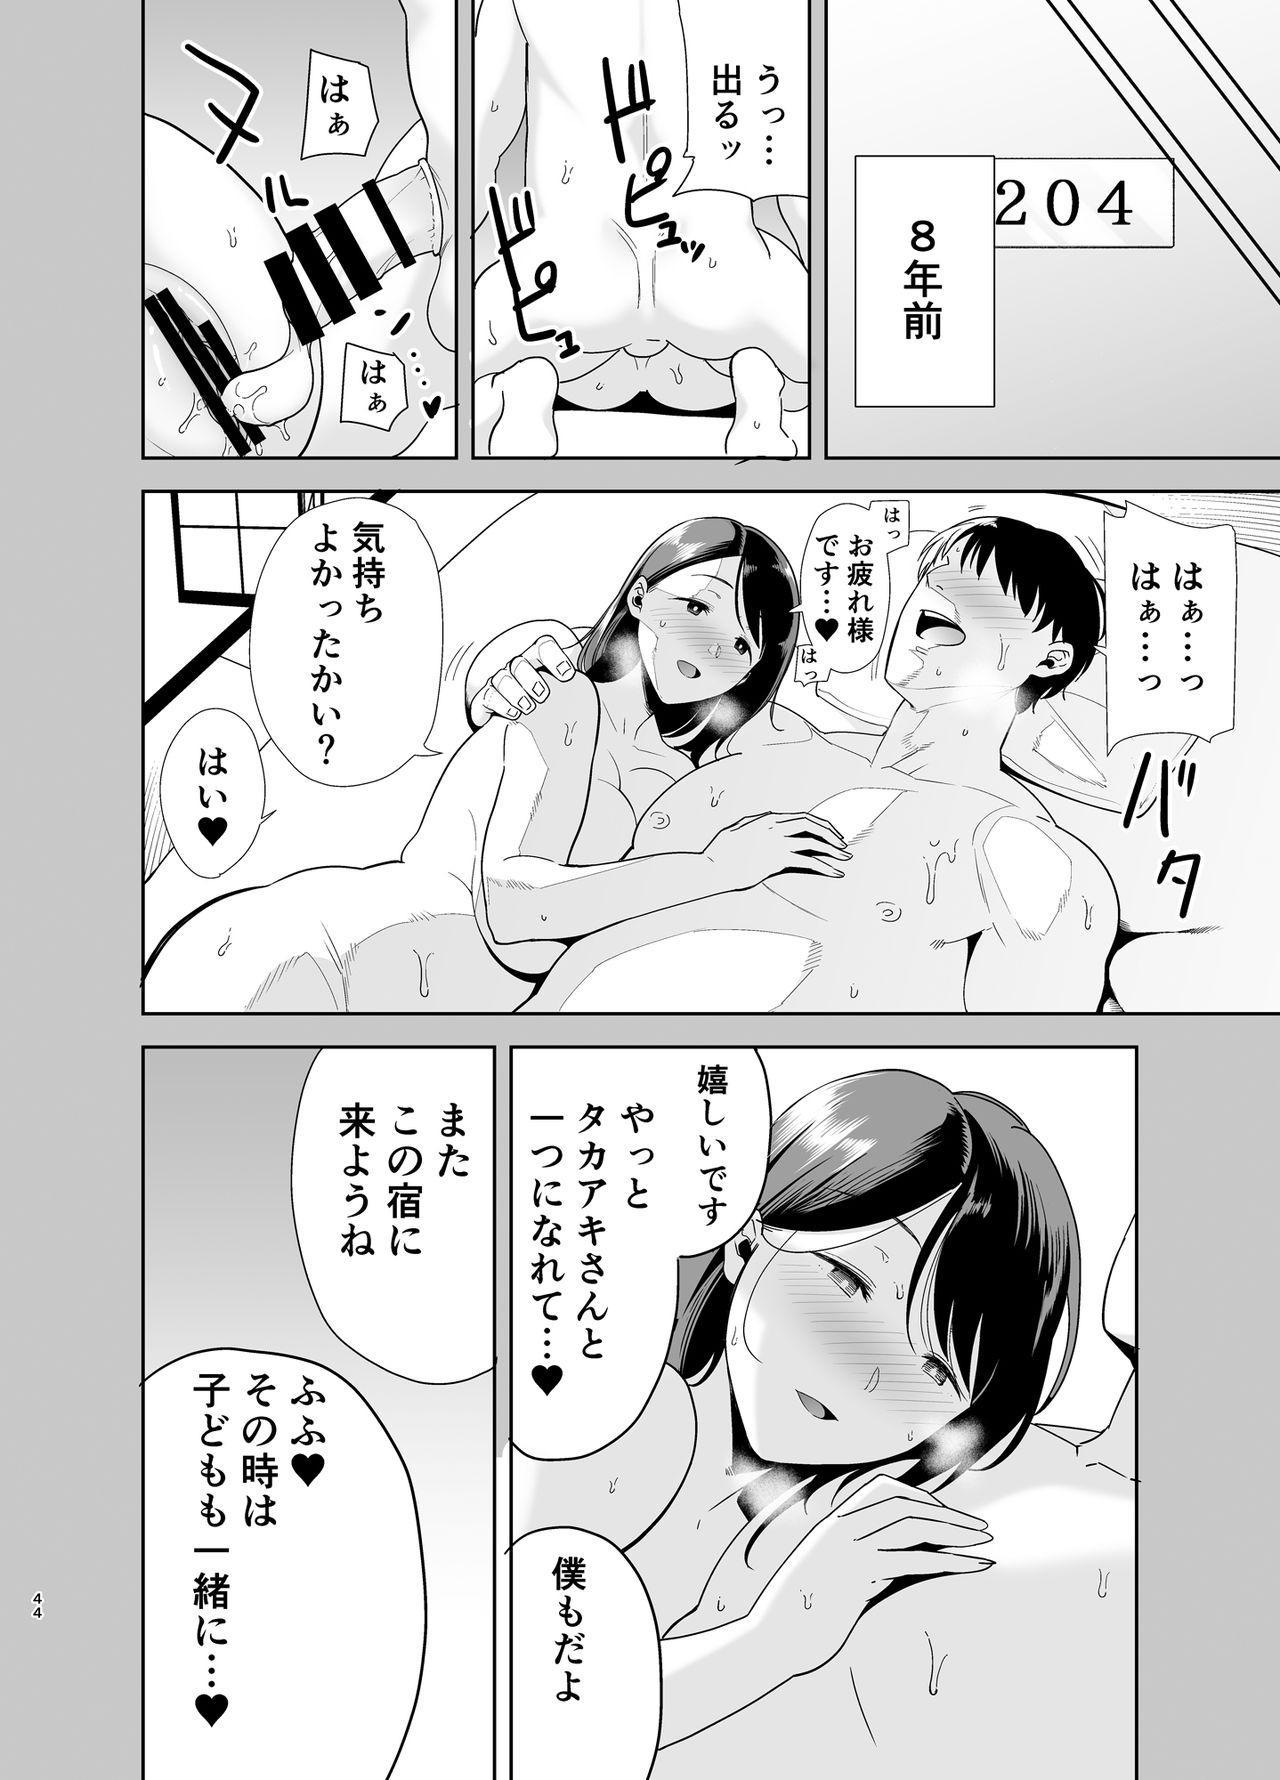 Natsuzuma 142